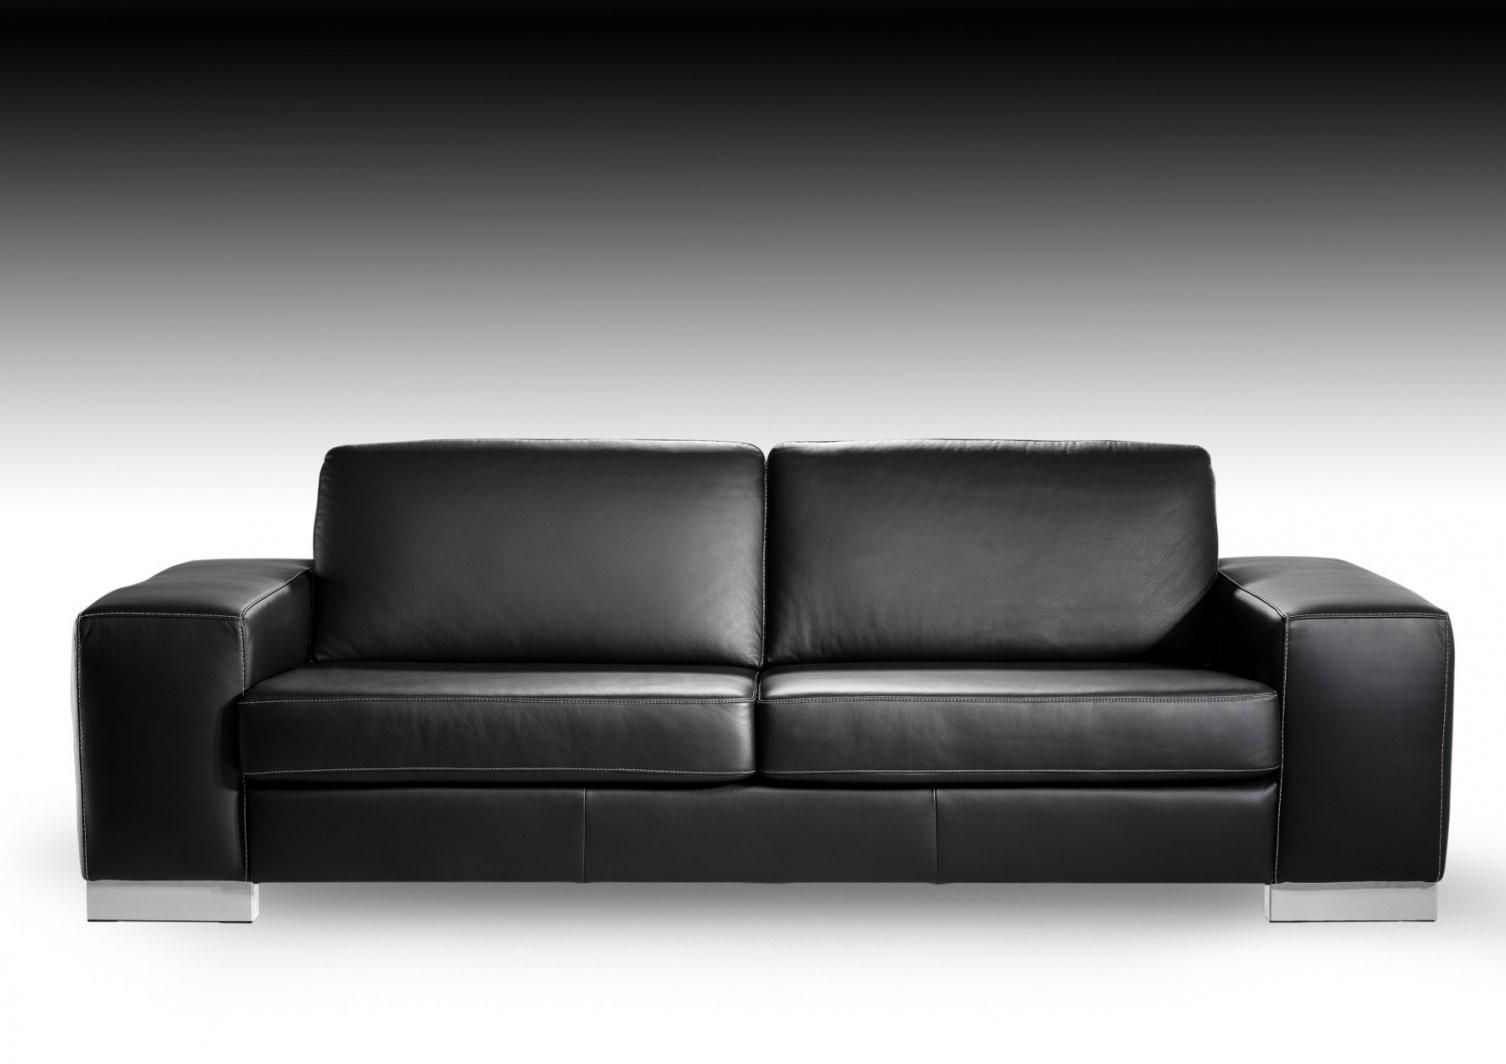 3 Sitzer Sofa Leder Beste Sofa Sitzer Leder 89827 Haus Ideen von Sofa Leder Schwarz 3 Sitzer Bild